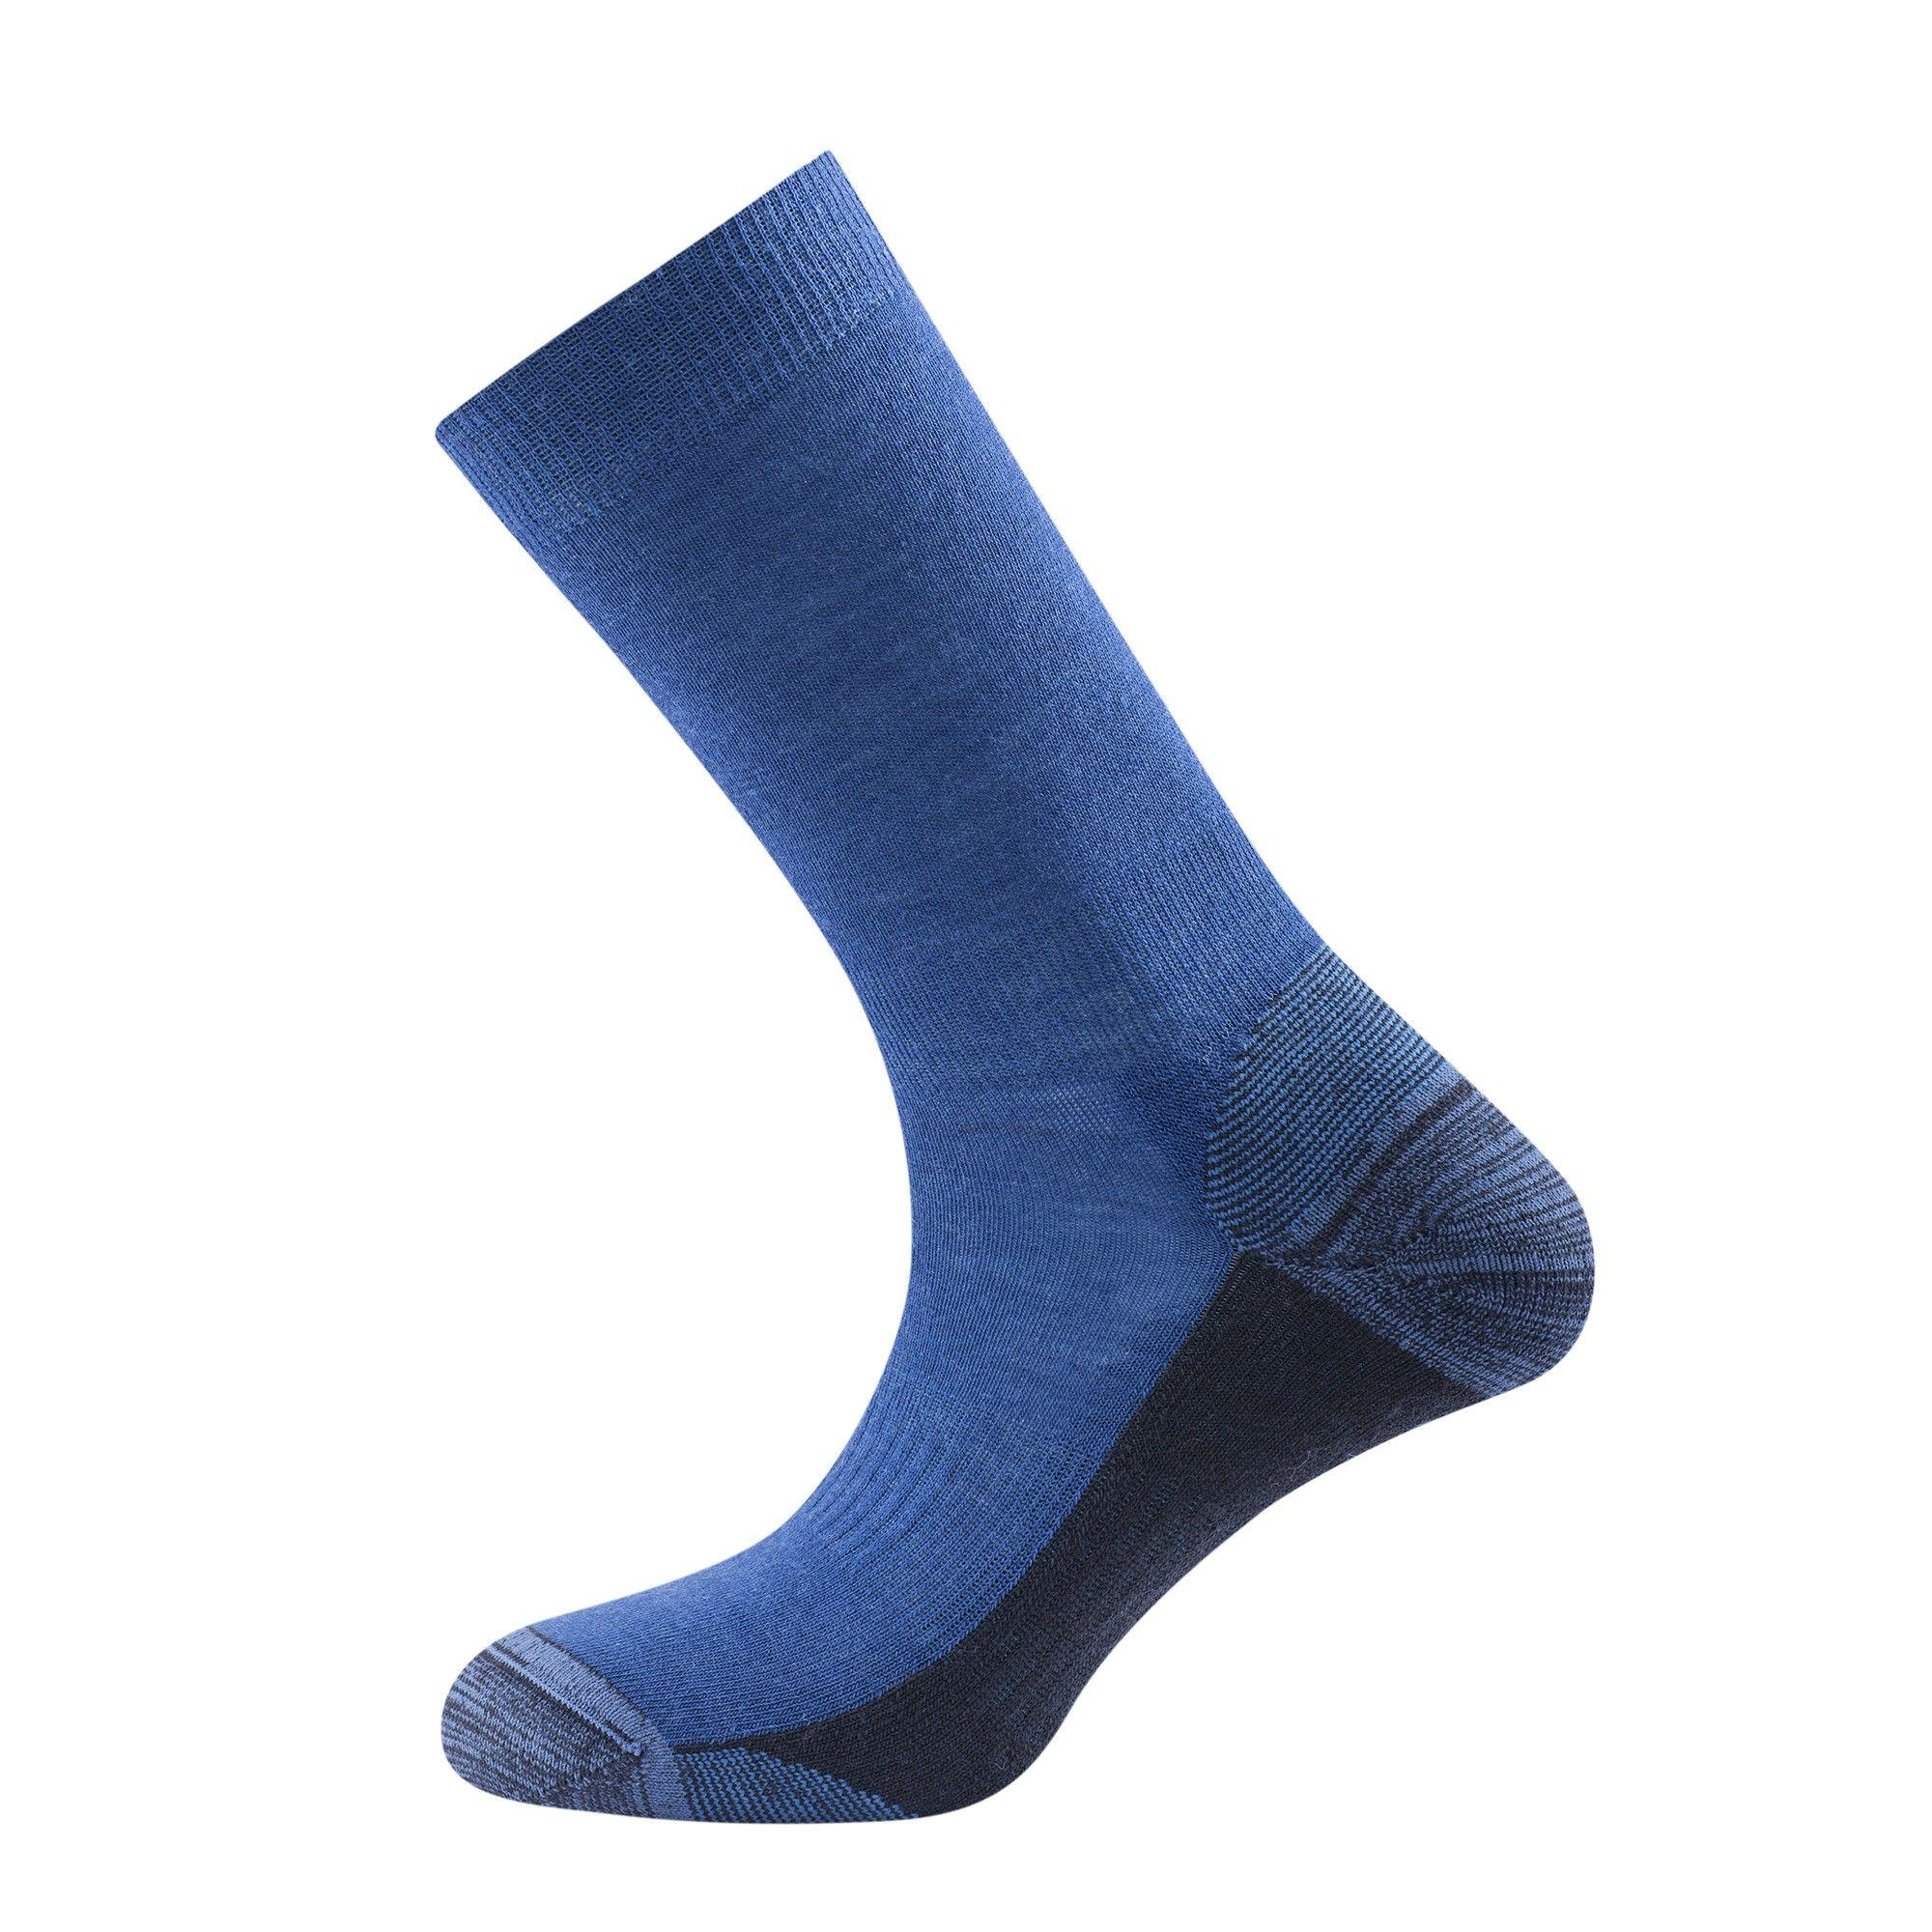 Devold Multi Medium Sock Blau, Merino Socken, 41-43